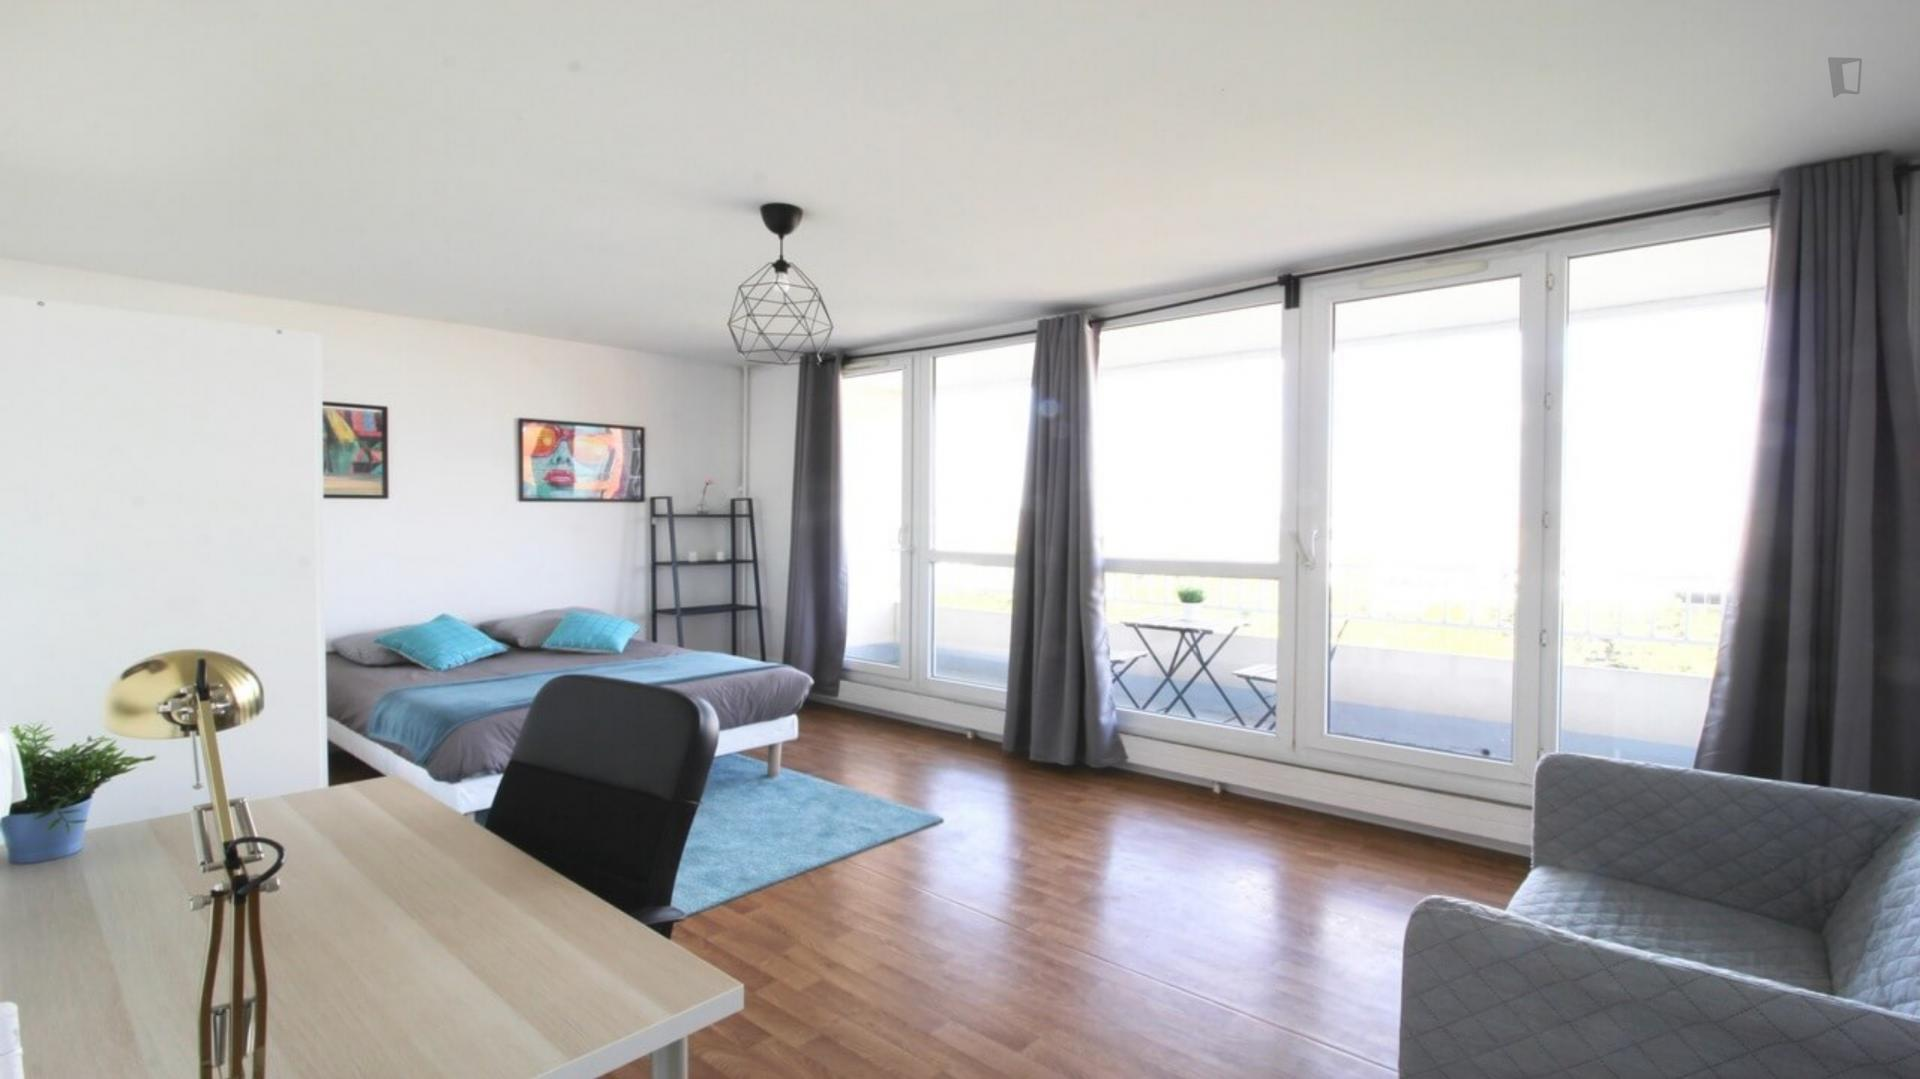 Allende - Bedroom with a balcony in Paris